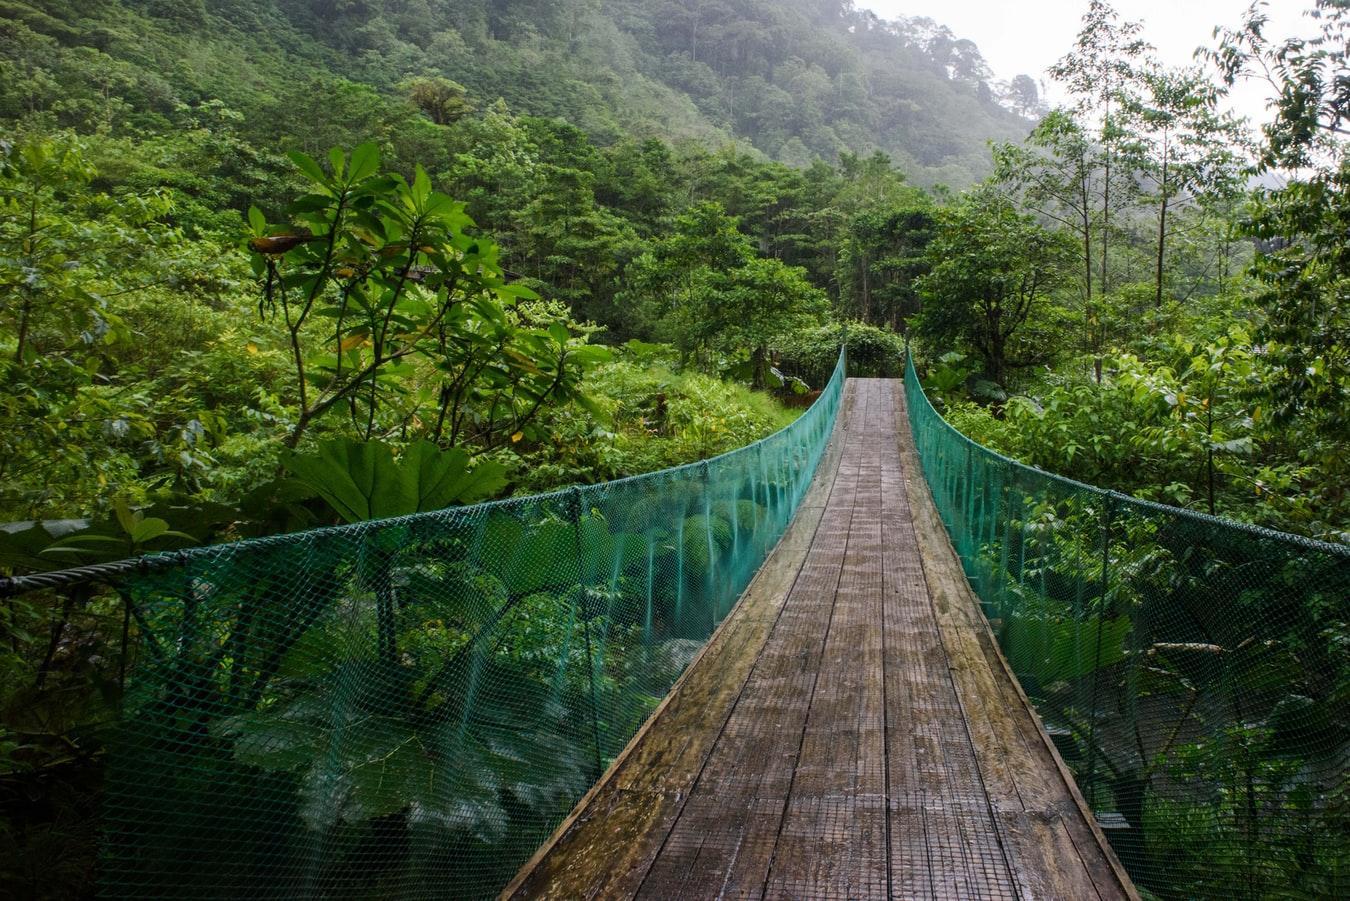 suspension bridge in a lush forest